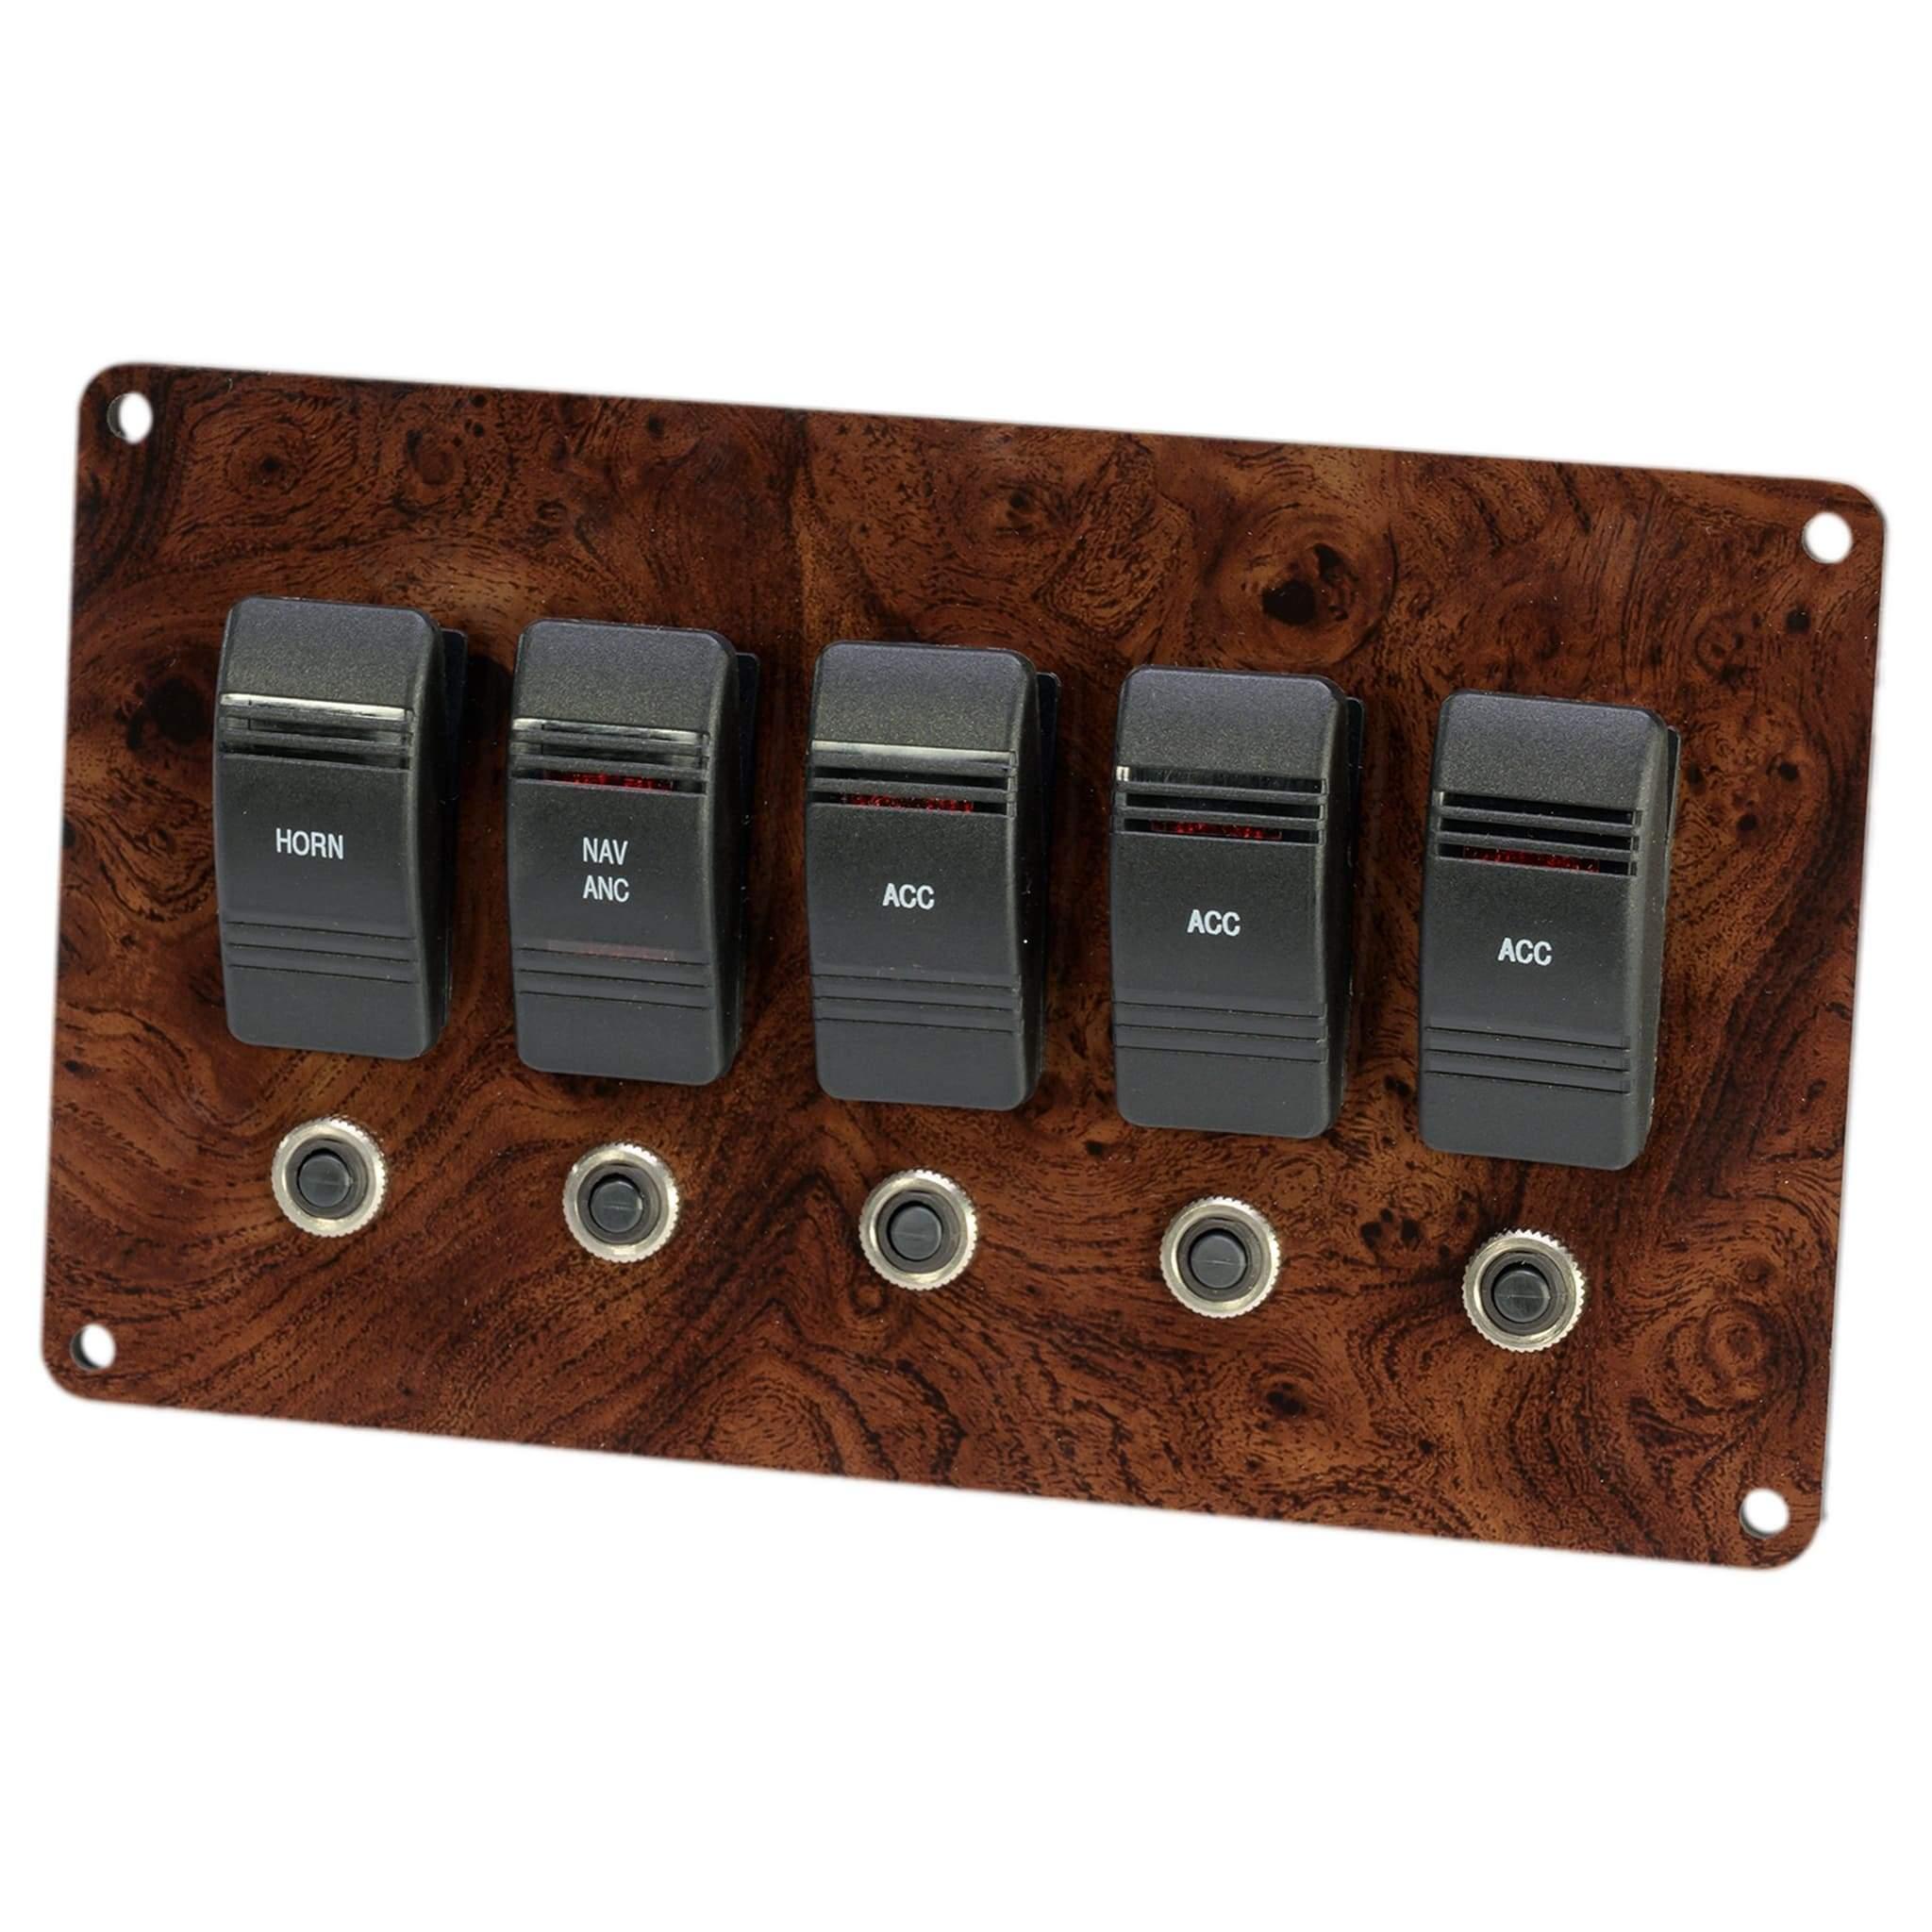 small pontoon boat switch panel pontoonstuff com pontoon boat wiring harness pontoonstuffcom [ 2048 x 2048 Pixel ]